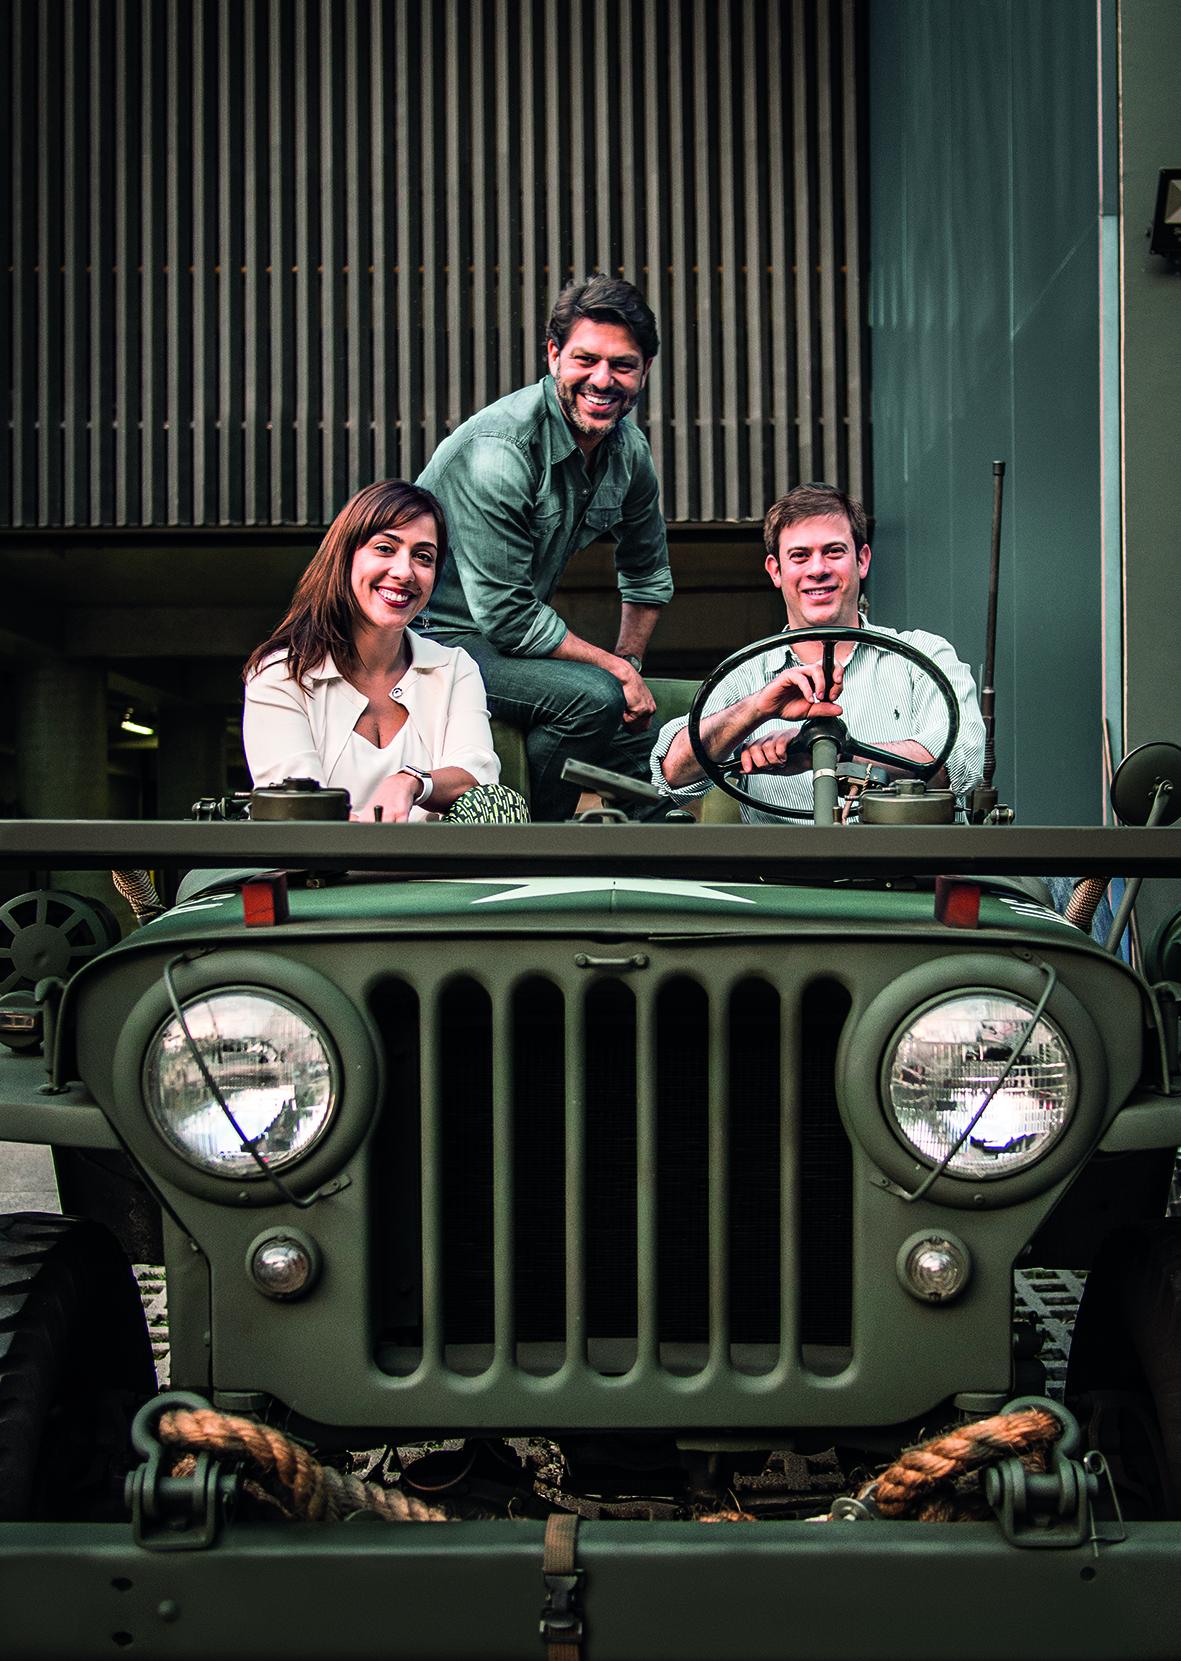 2927b0744 F.biz é a nova agência full-service das marcas Chrysler, Jeep, Dodge ...